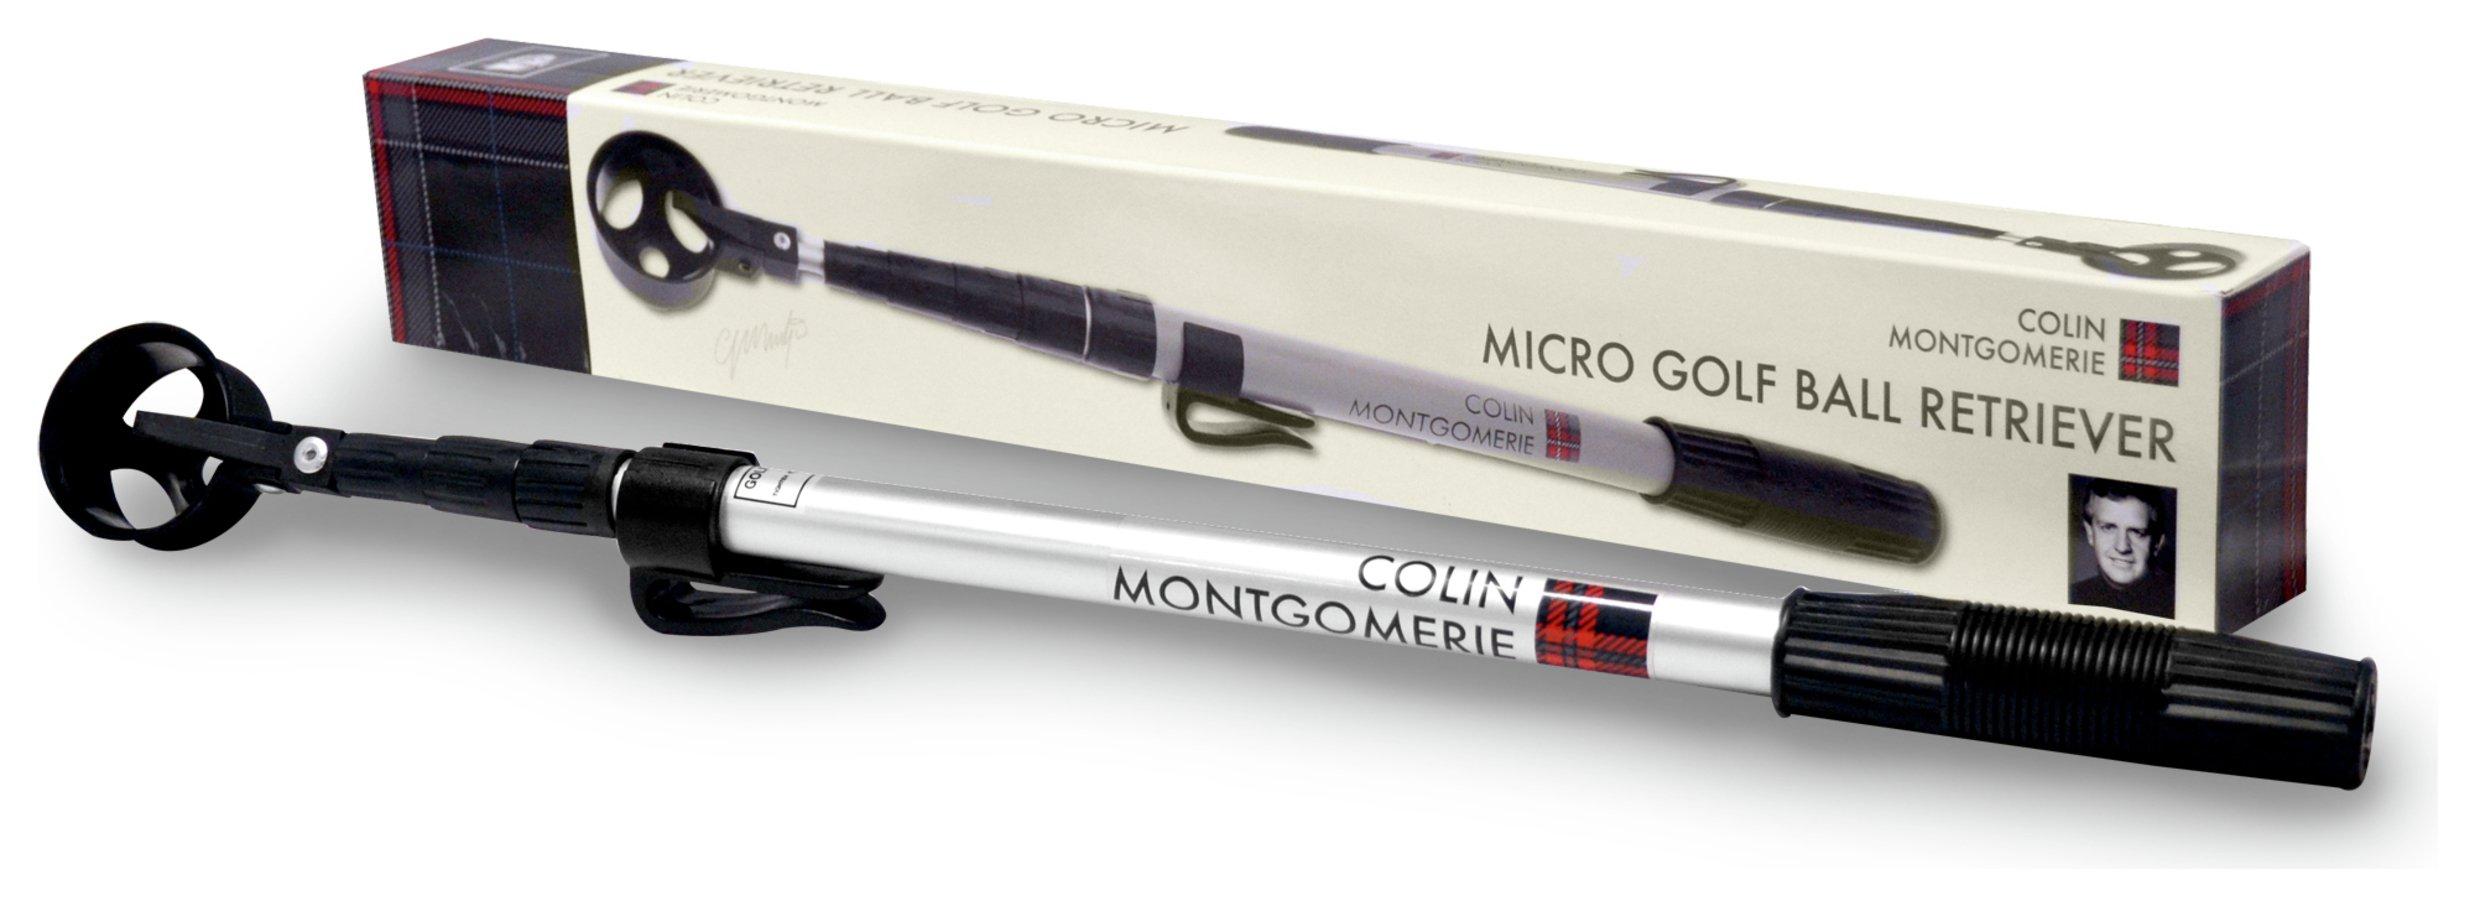 Image of Colin Montgomerie - Micro Golf Ball Retriever